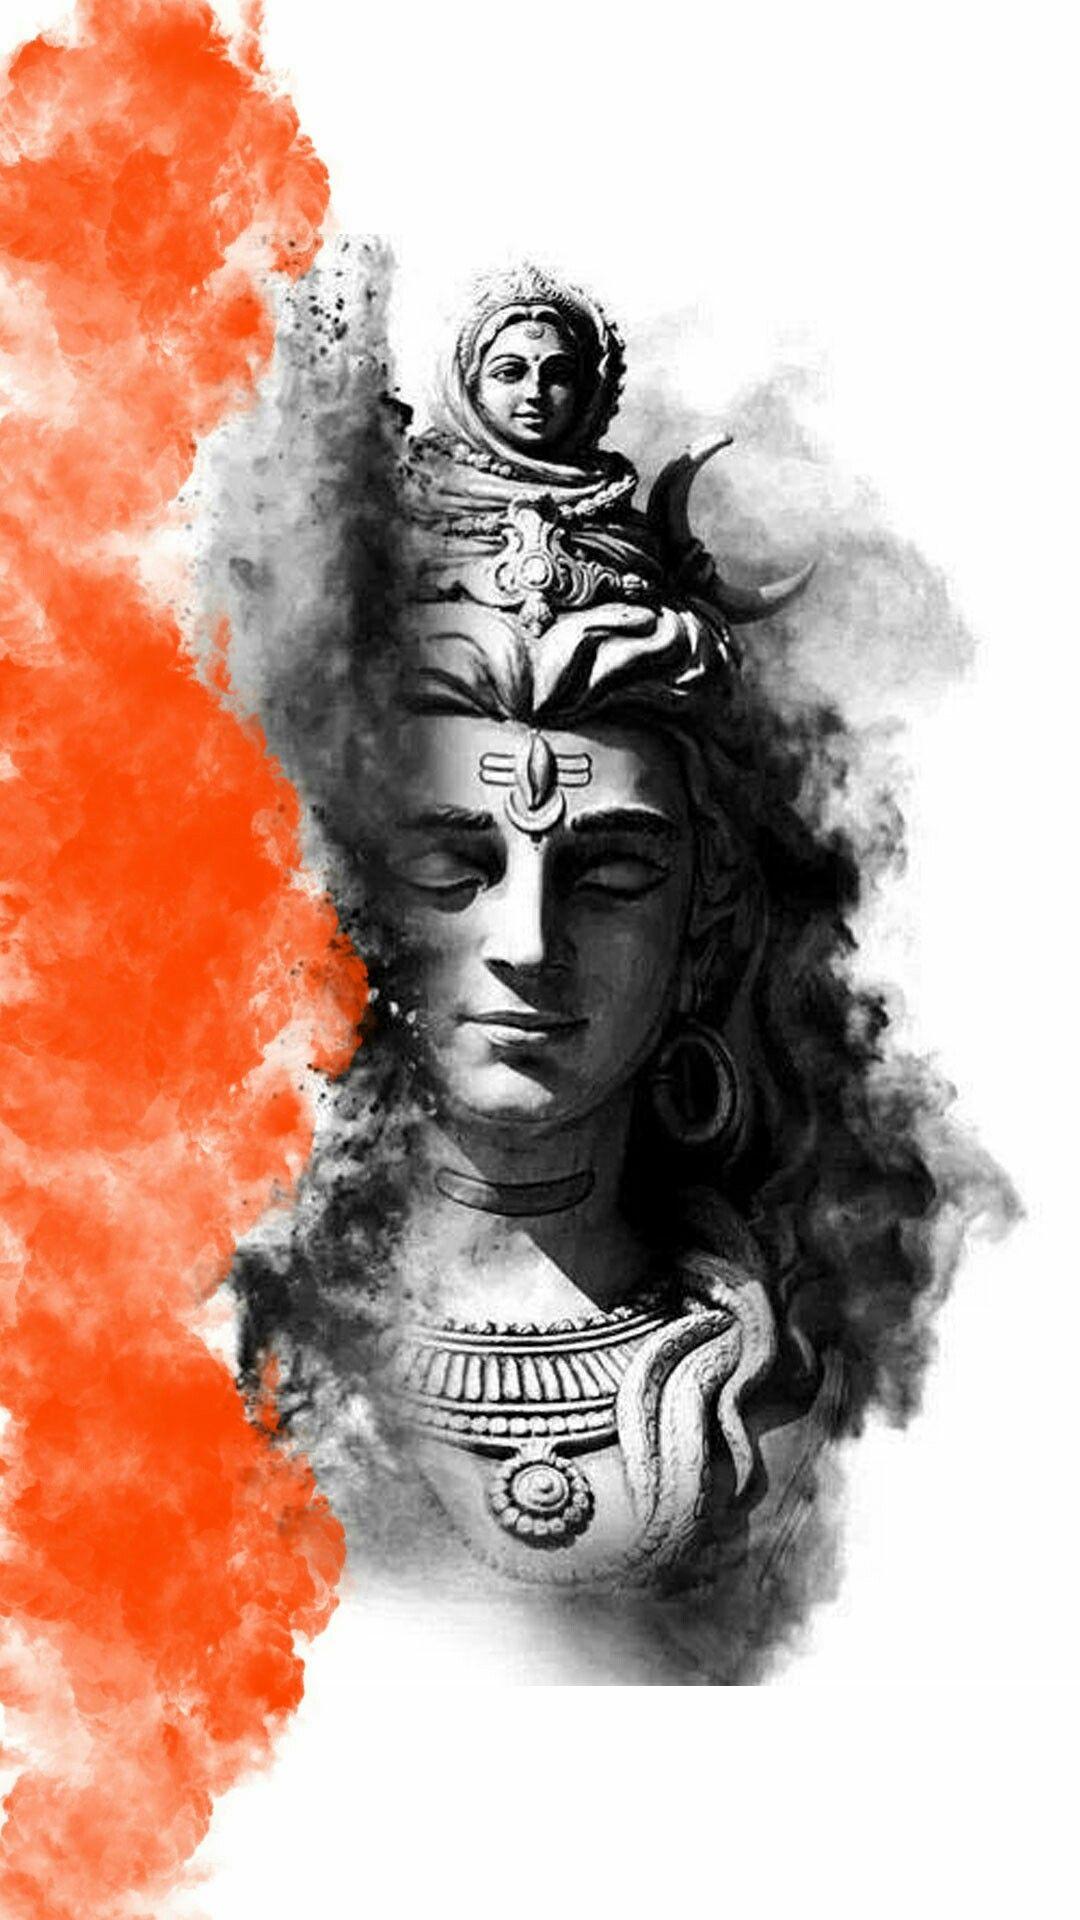 Pin By Lekhraj Sahu On Lord Shiva Wallpaper Shiva Lord Shiva